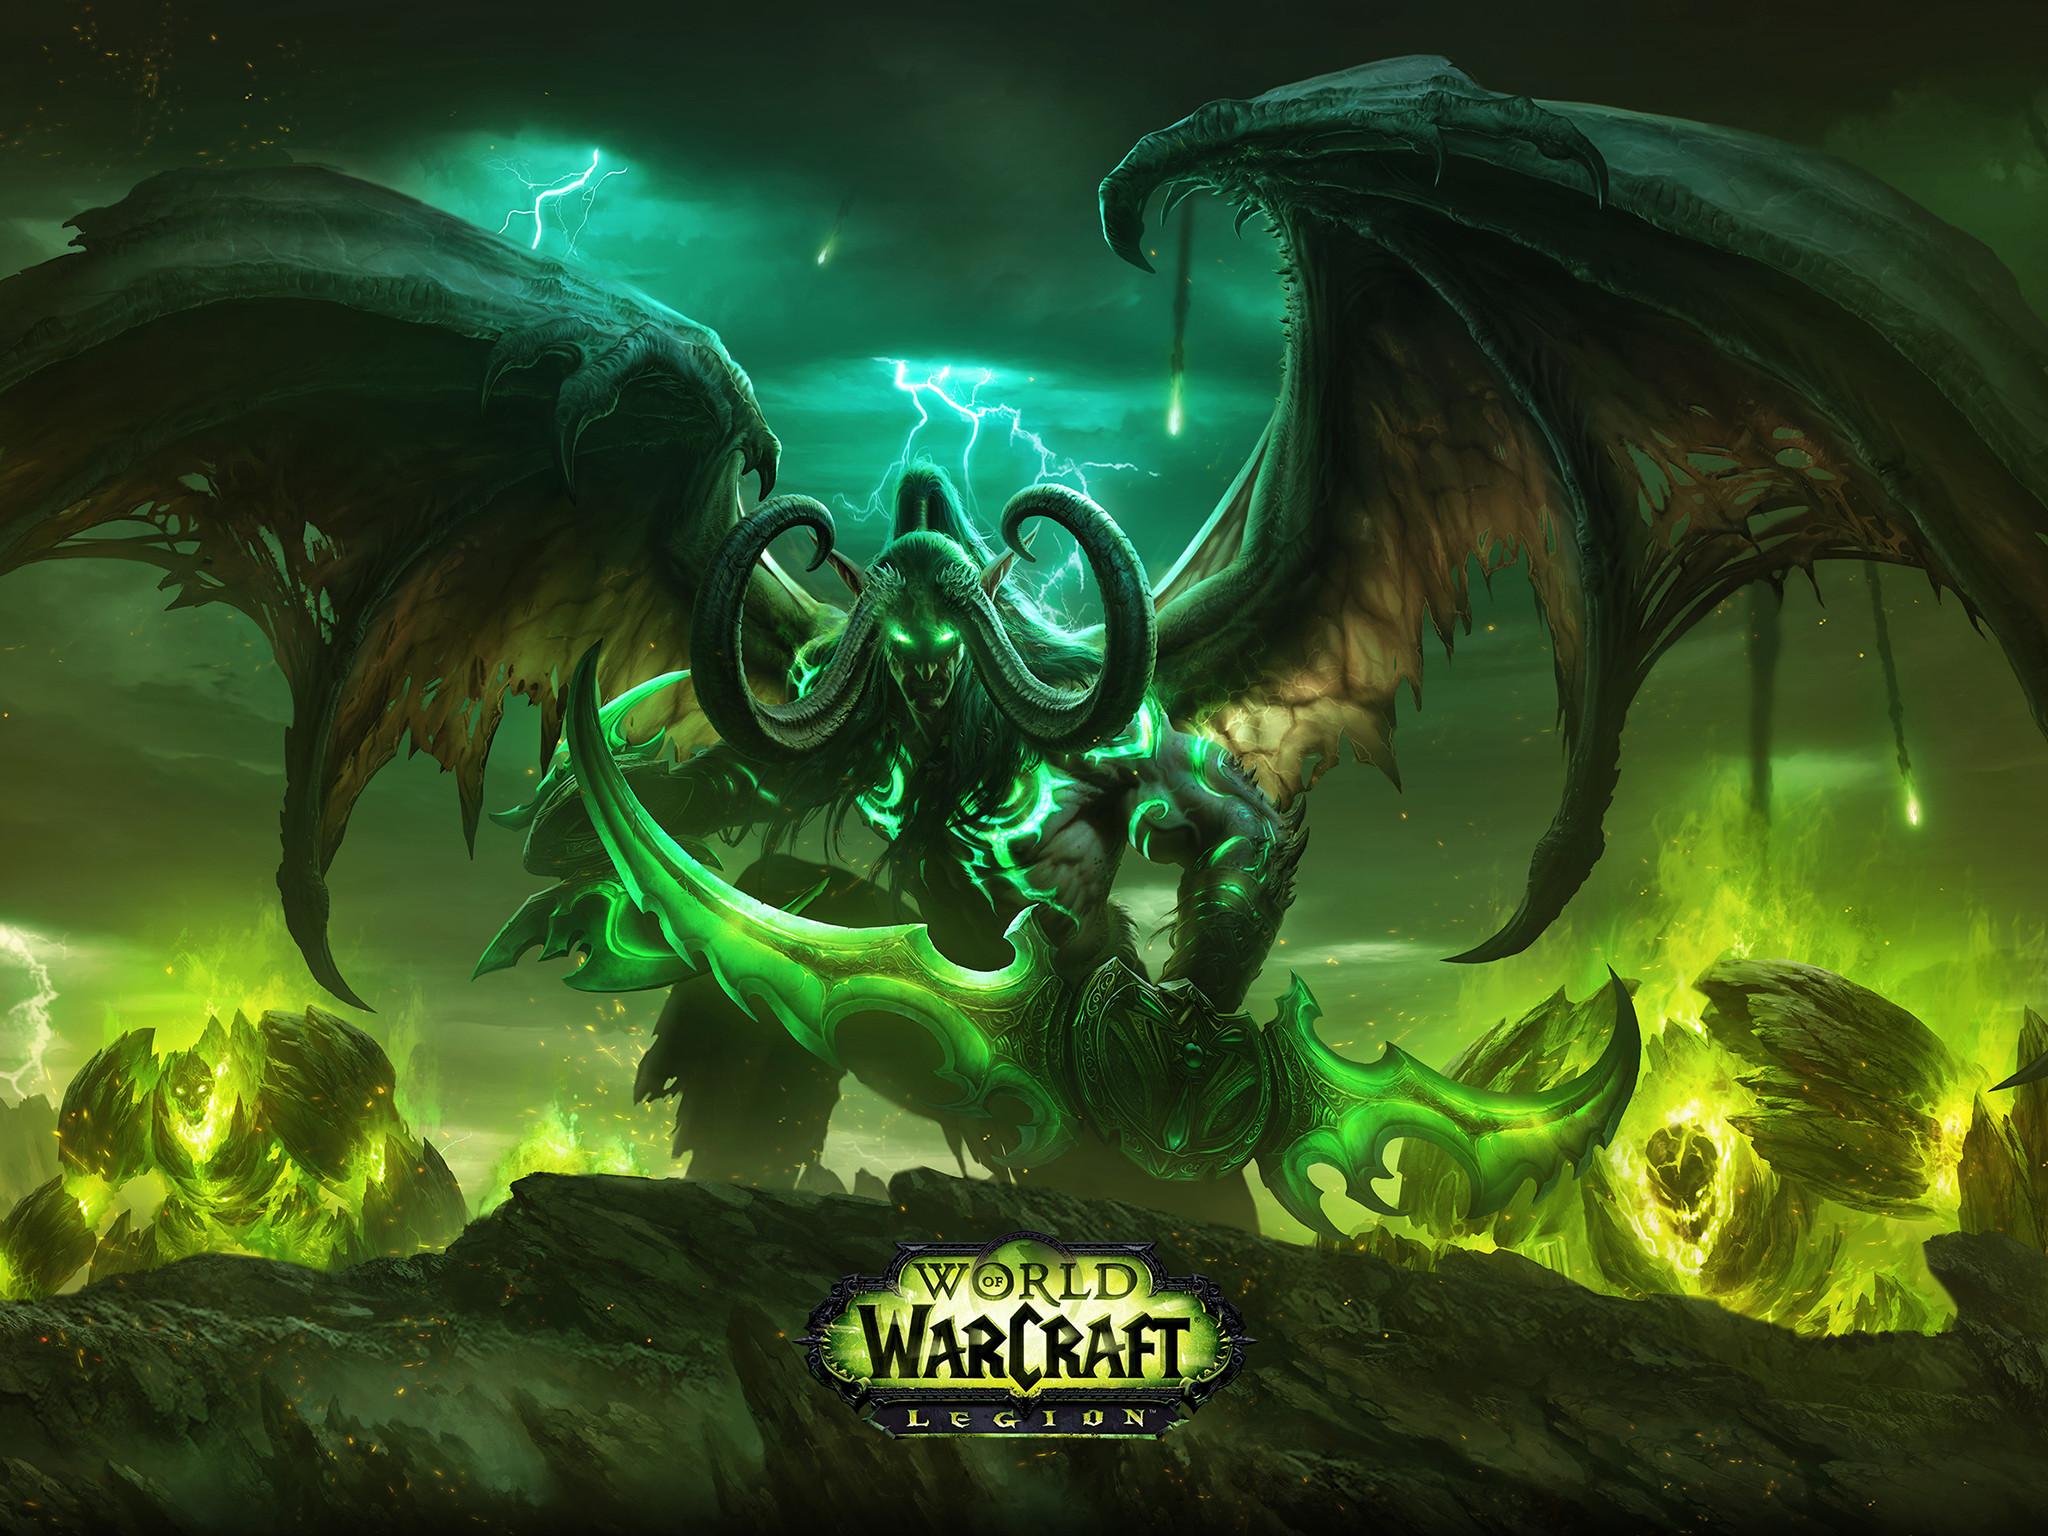 World of Warcraft®